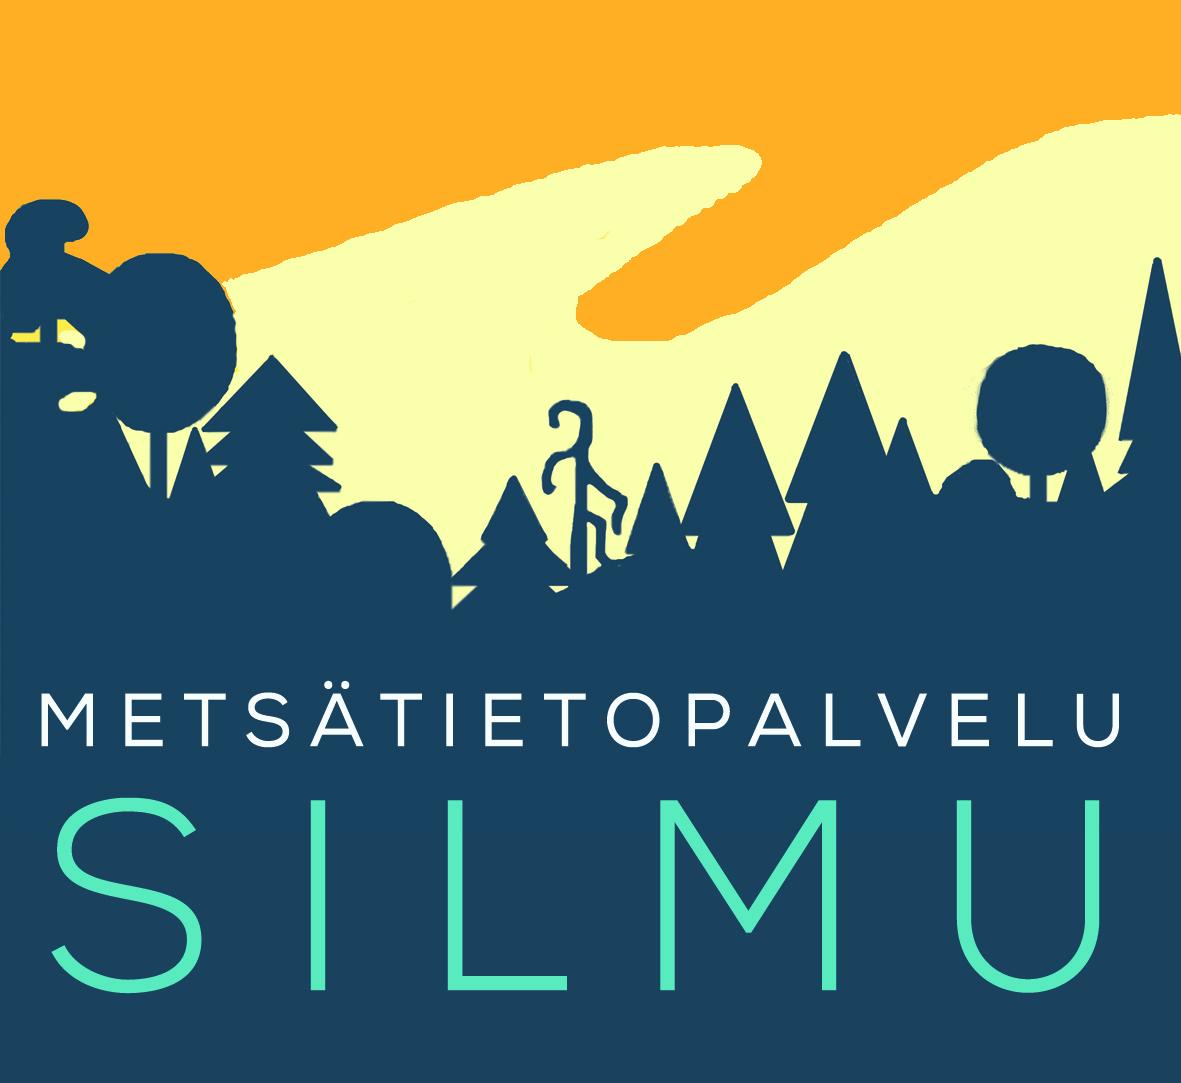 SILMU_logo_jpg12022018.jpg